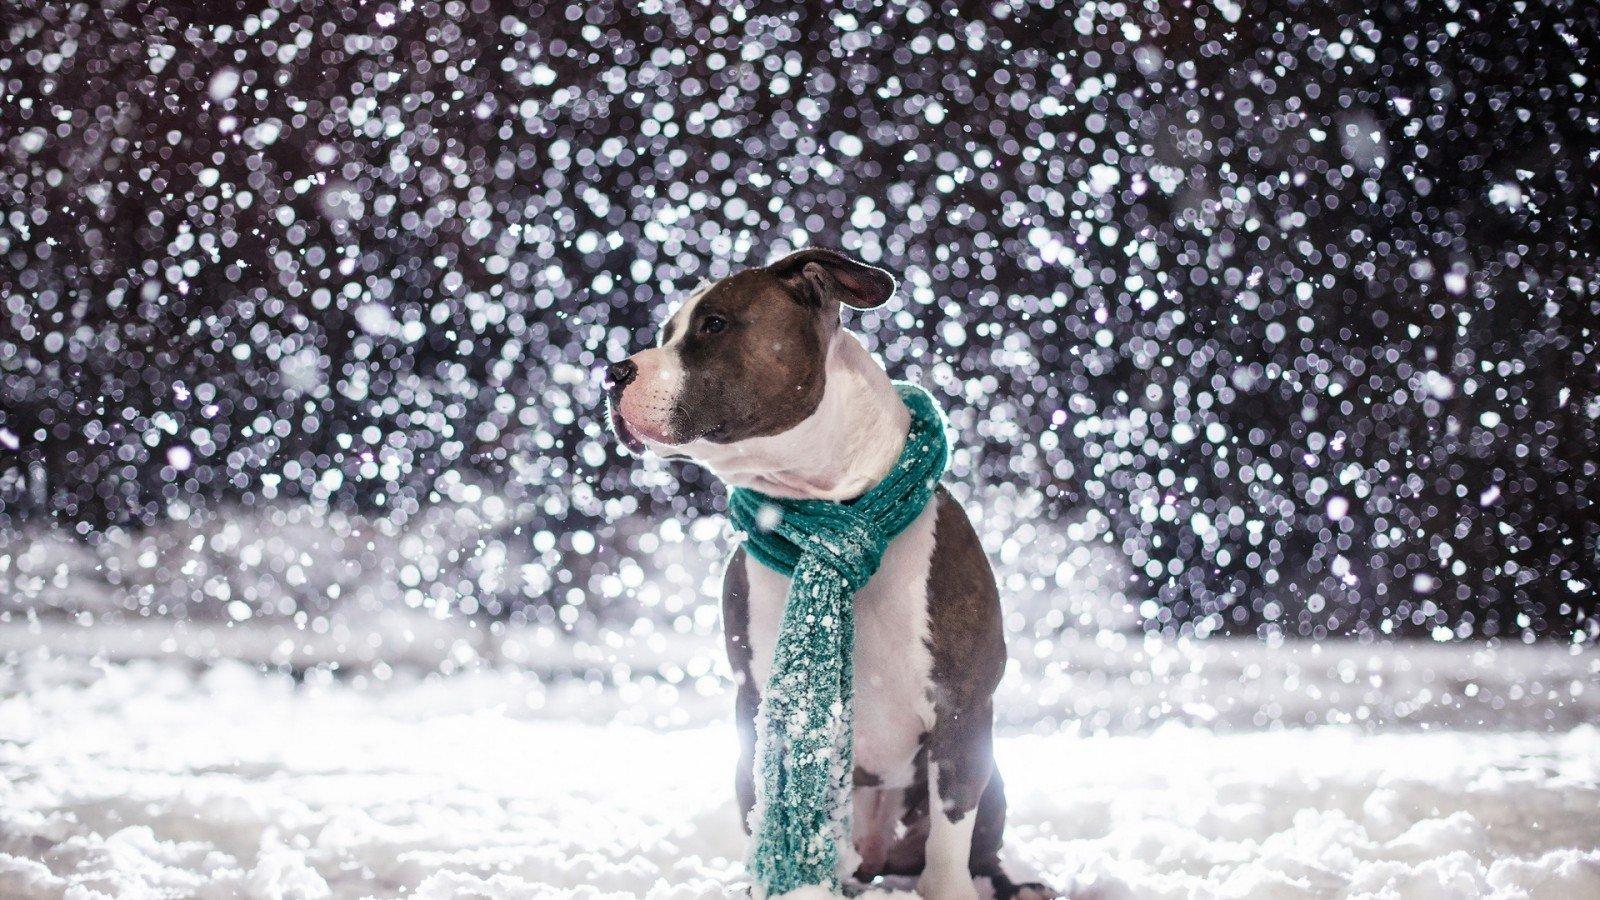 Dog and snow wallpaper   ForWallpapercom 1600x900